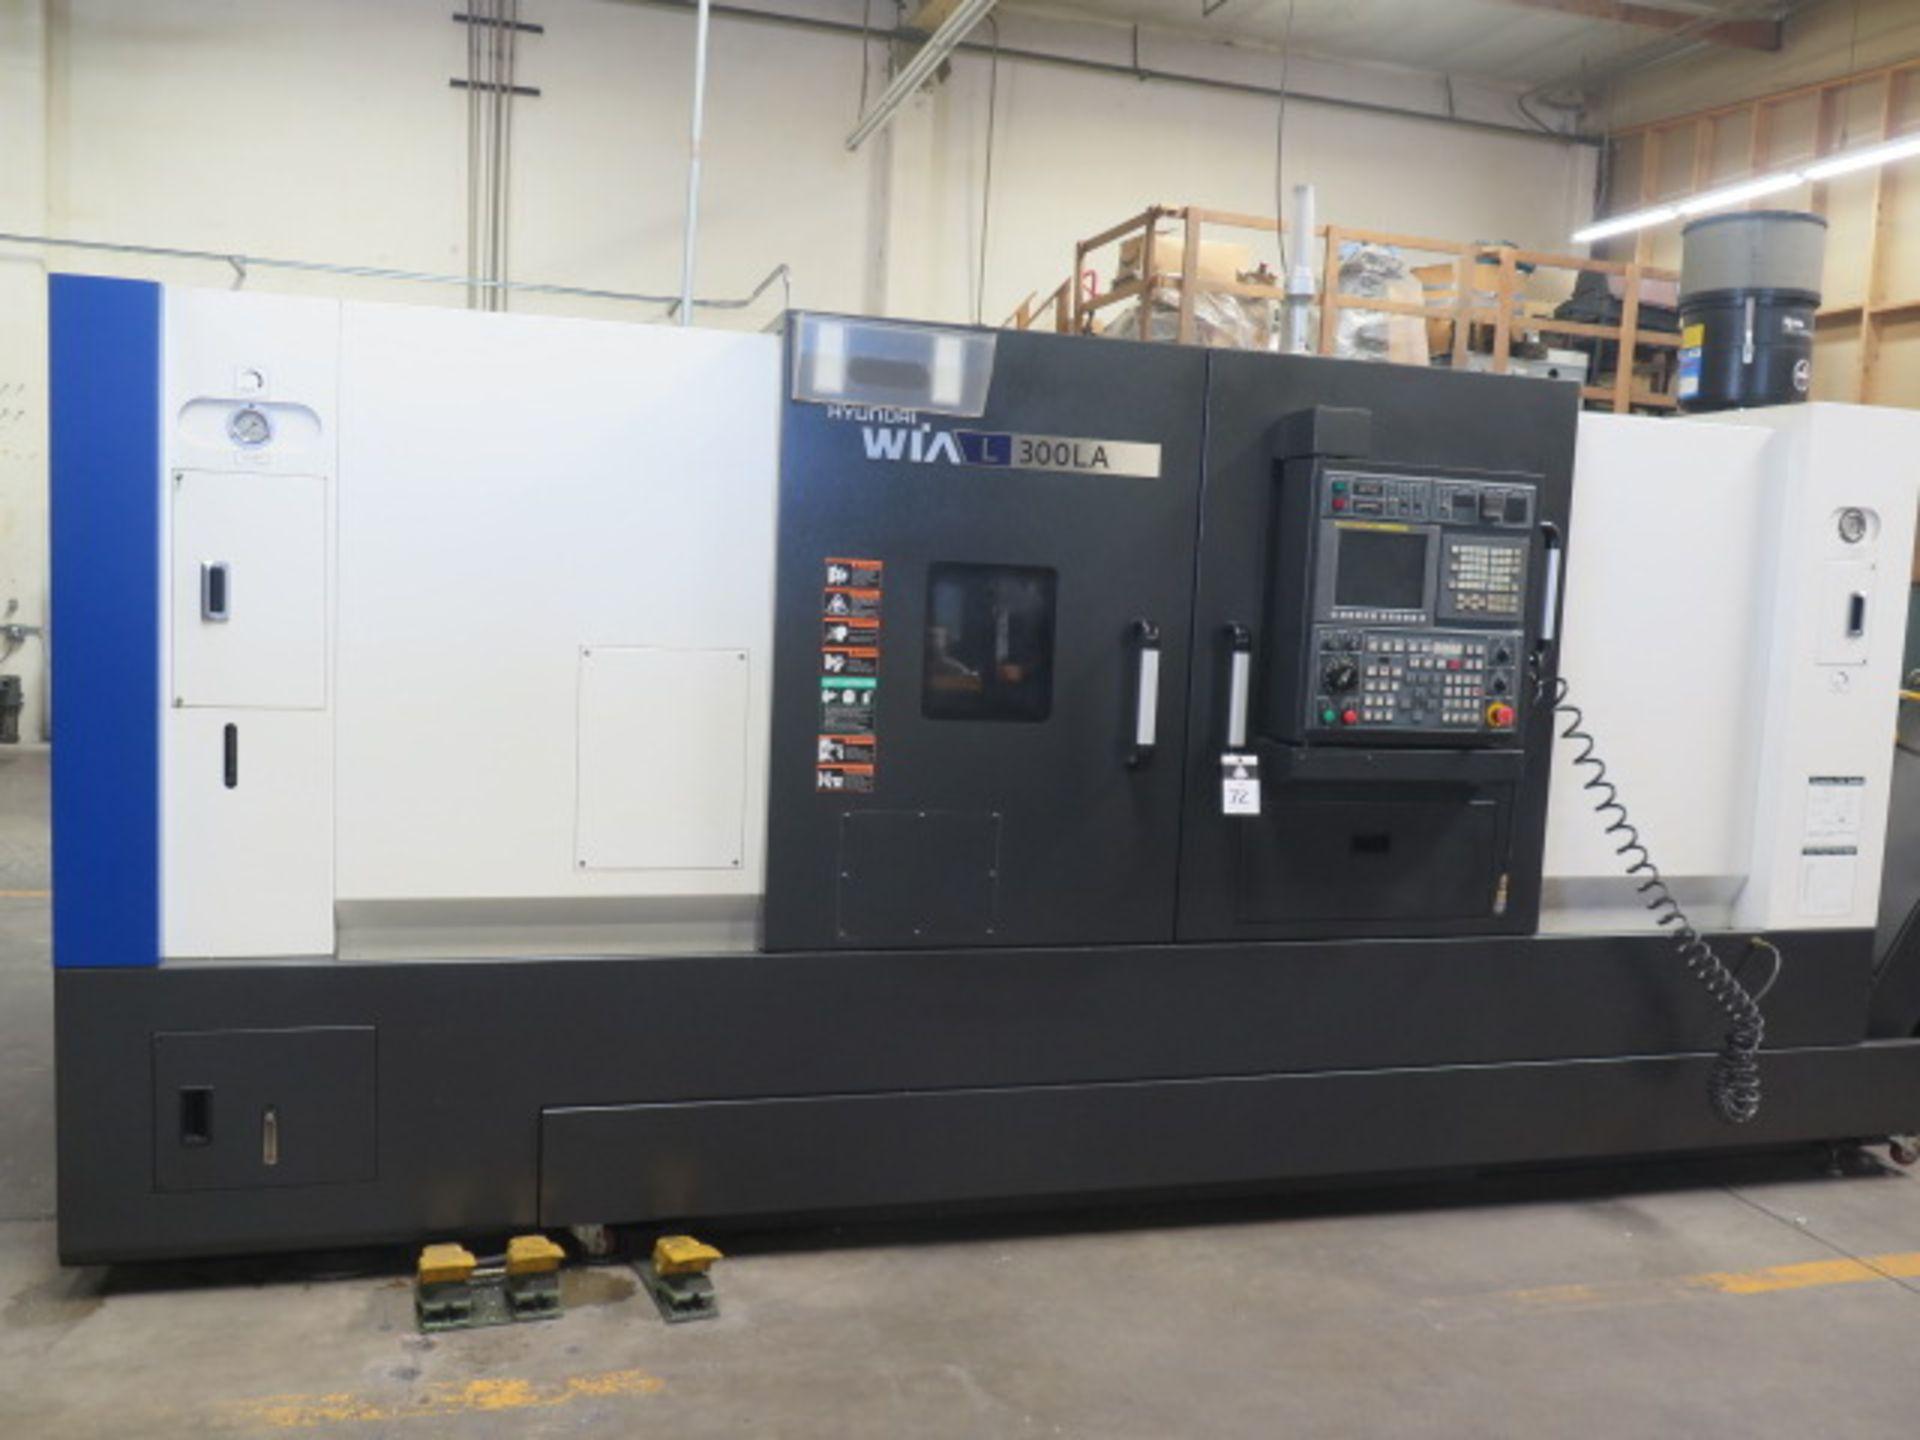 2016 Hyundai WIA L300LA CNC Turning Center s/n G3726-0083 w/ Fanuc i-Series Controls, SOLD AS IS